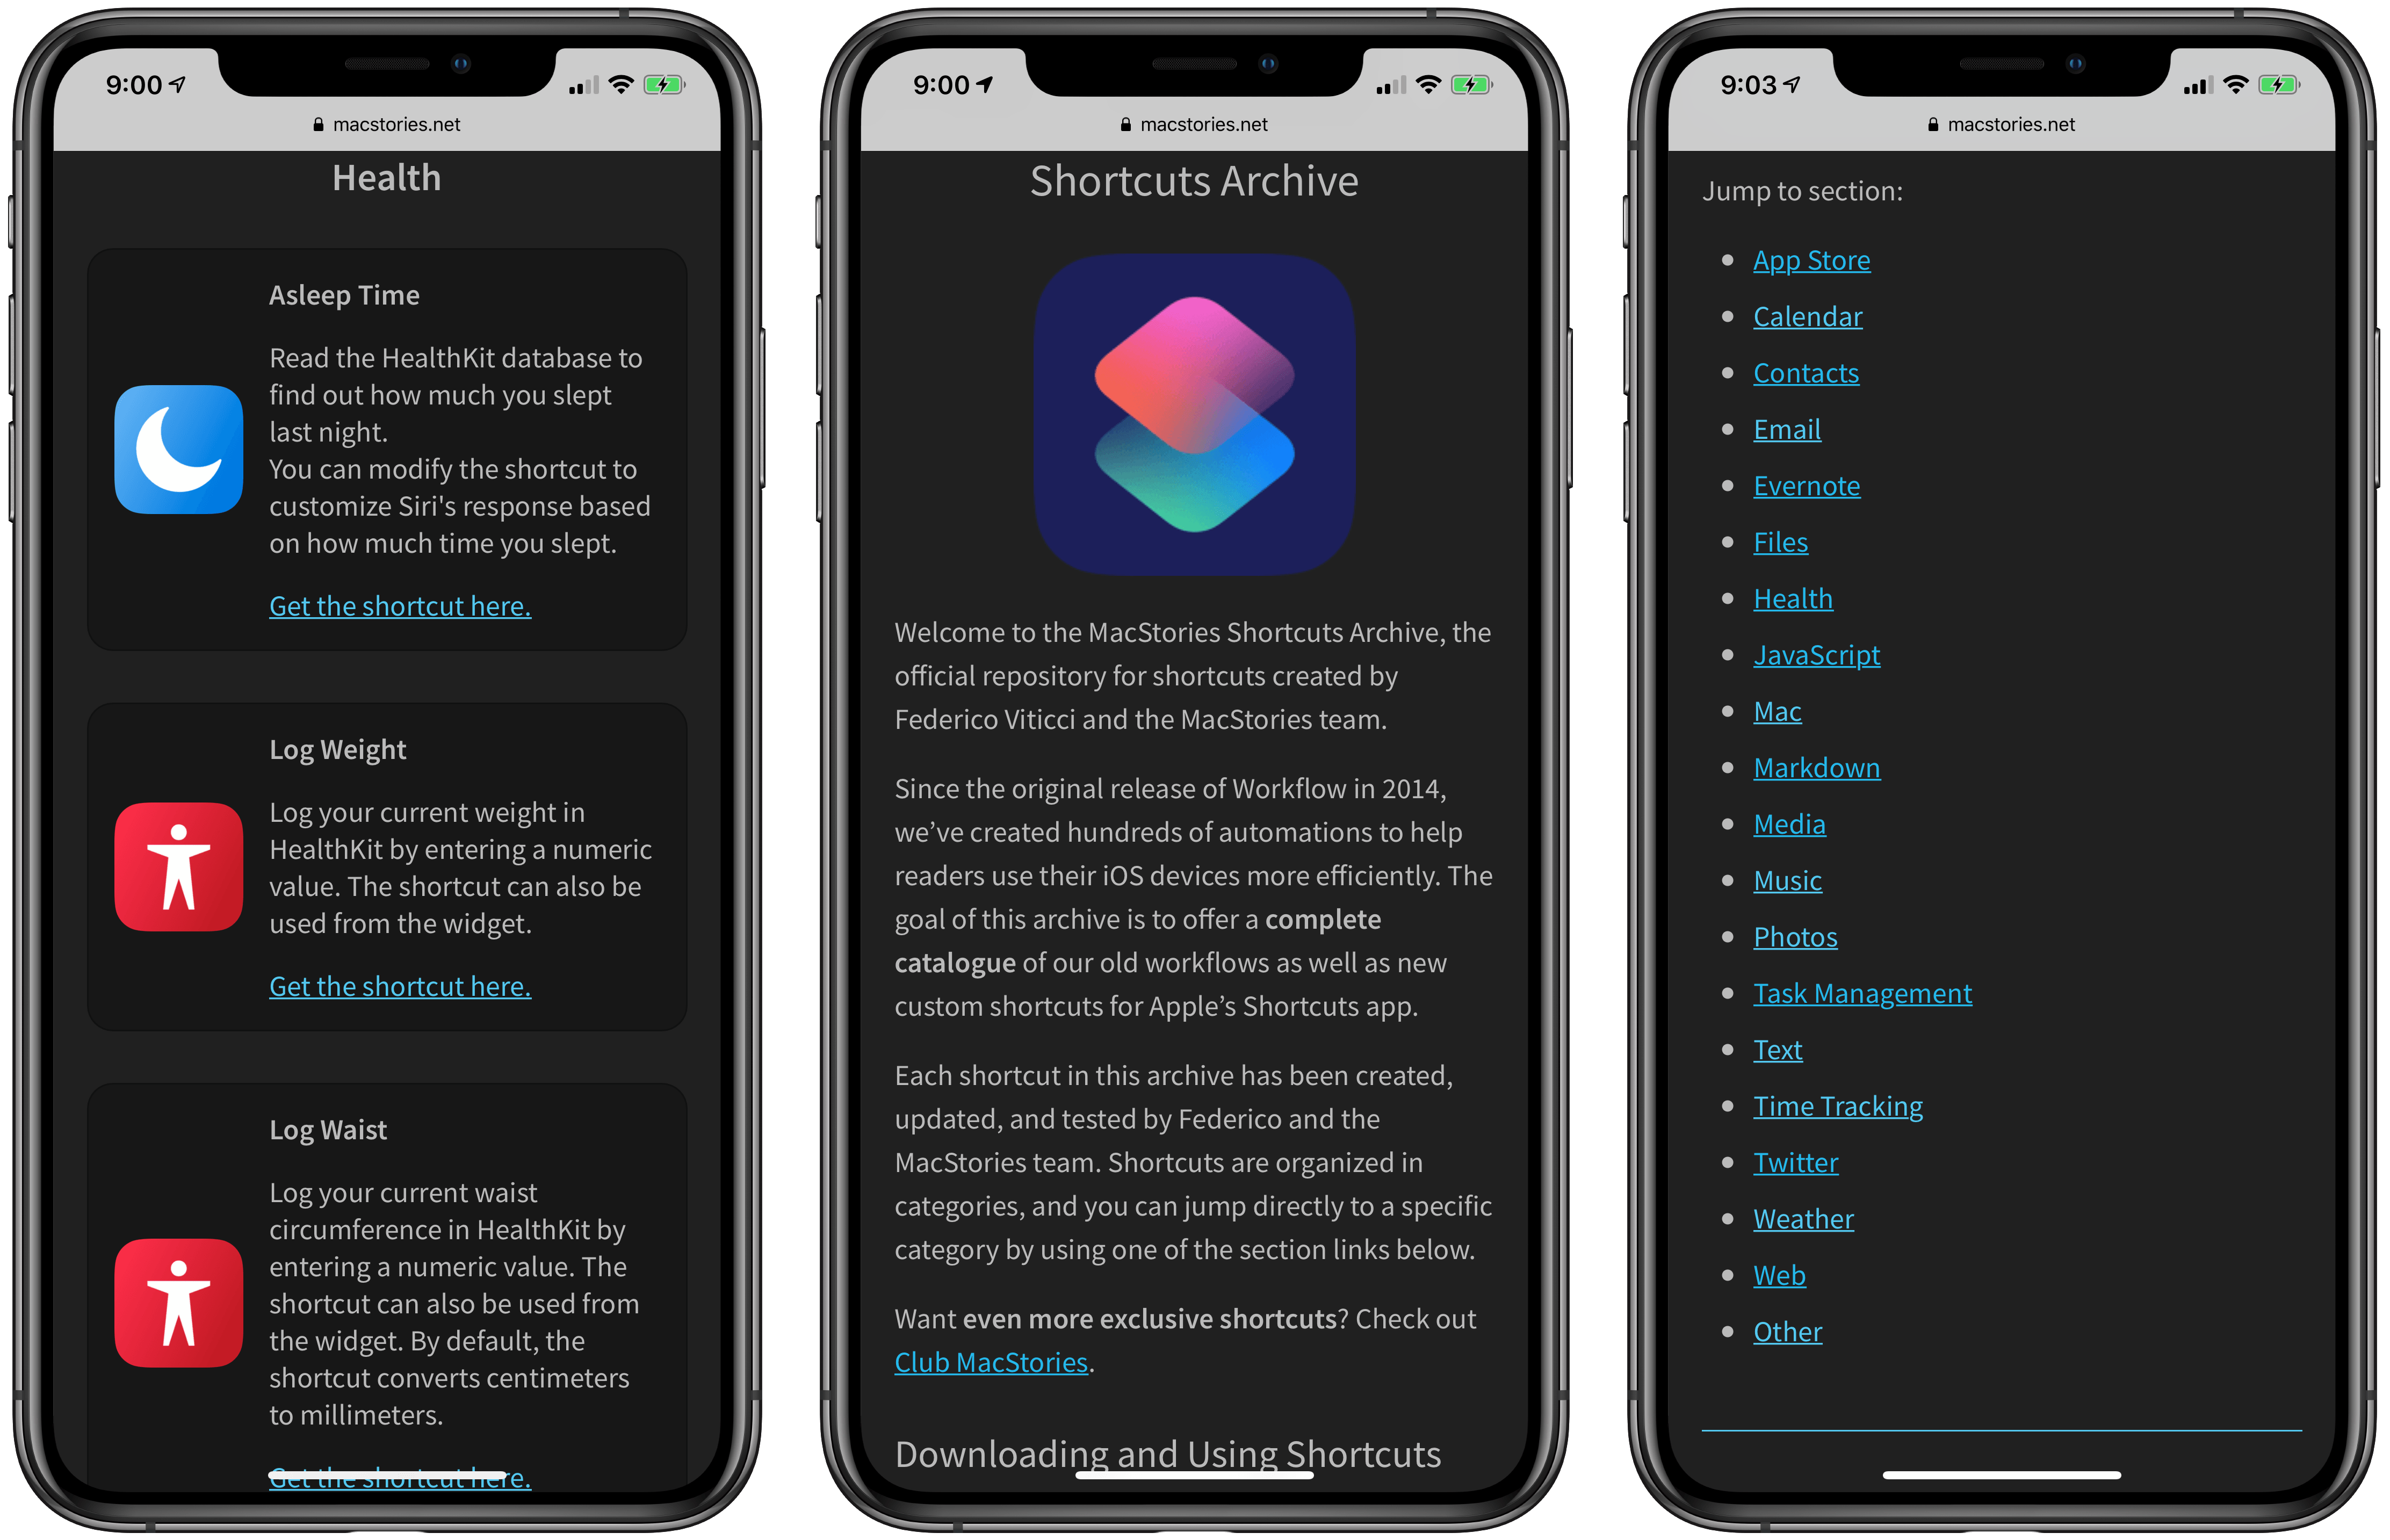 MacStories Shortcuts Archive